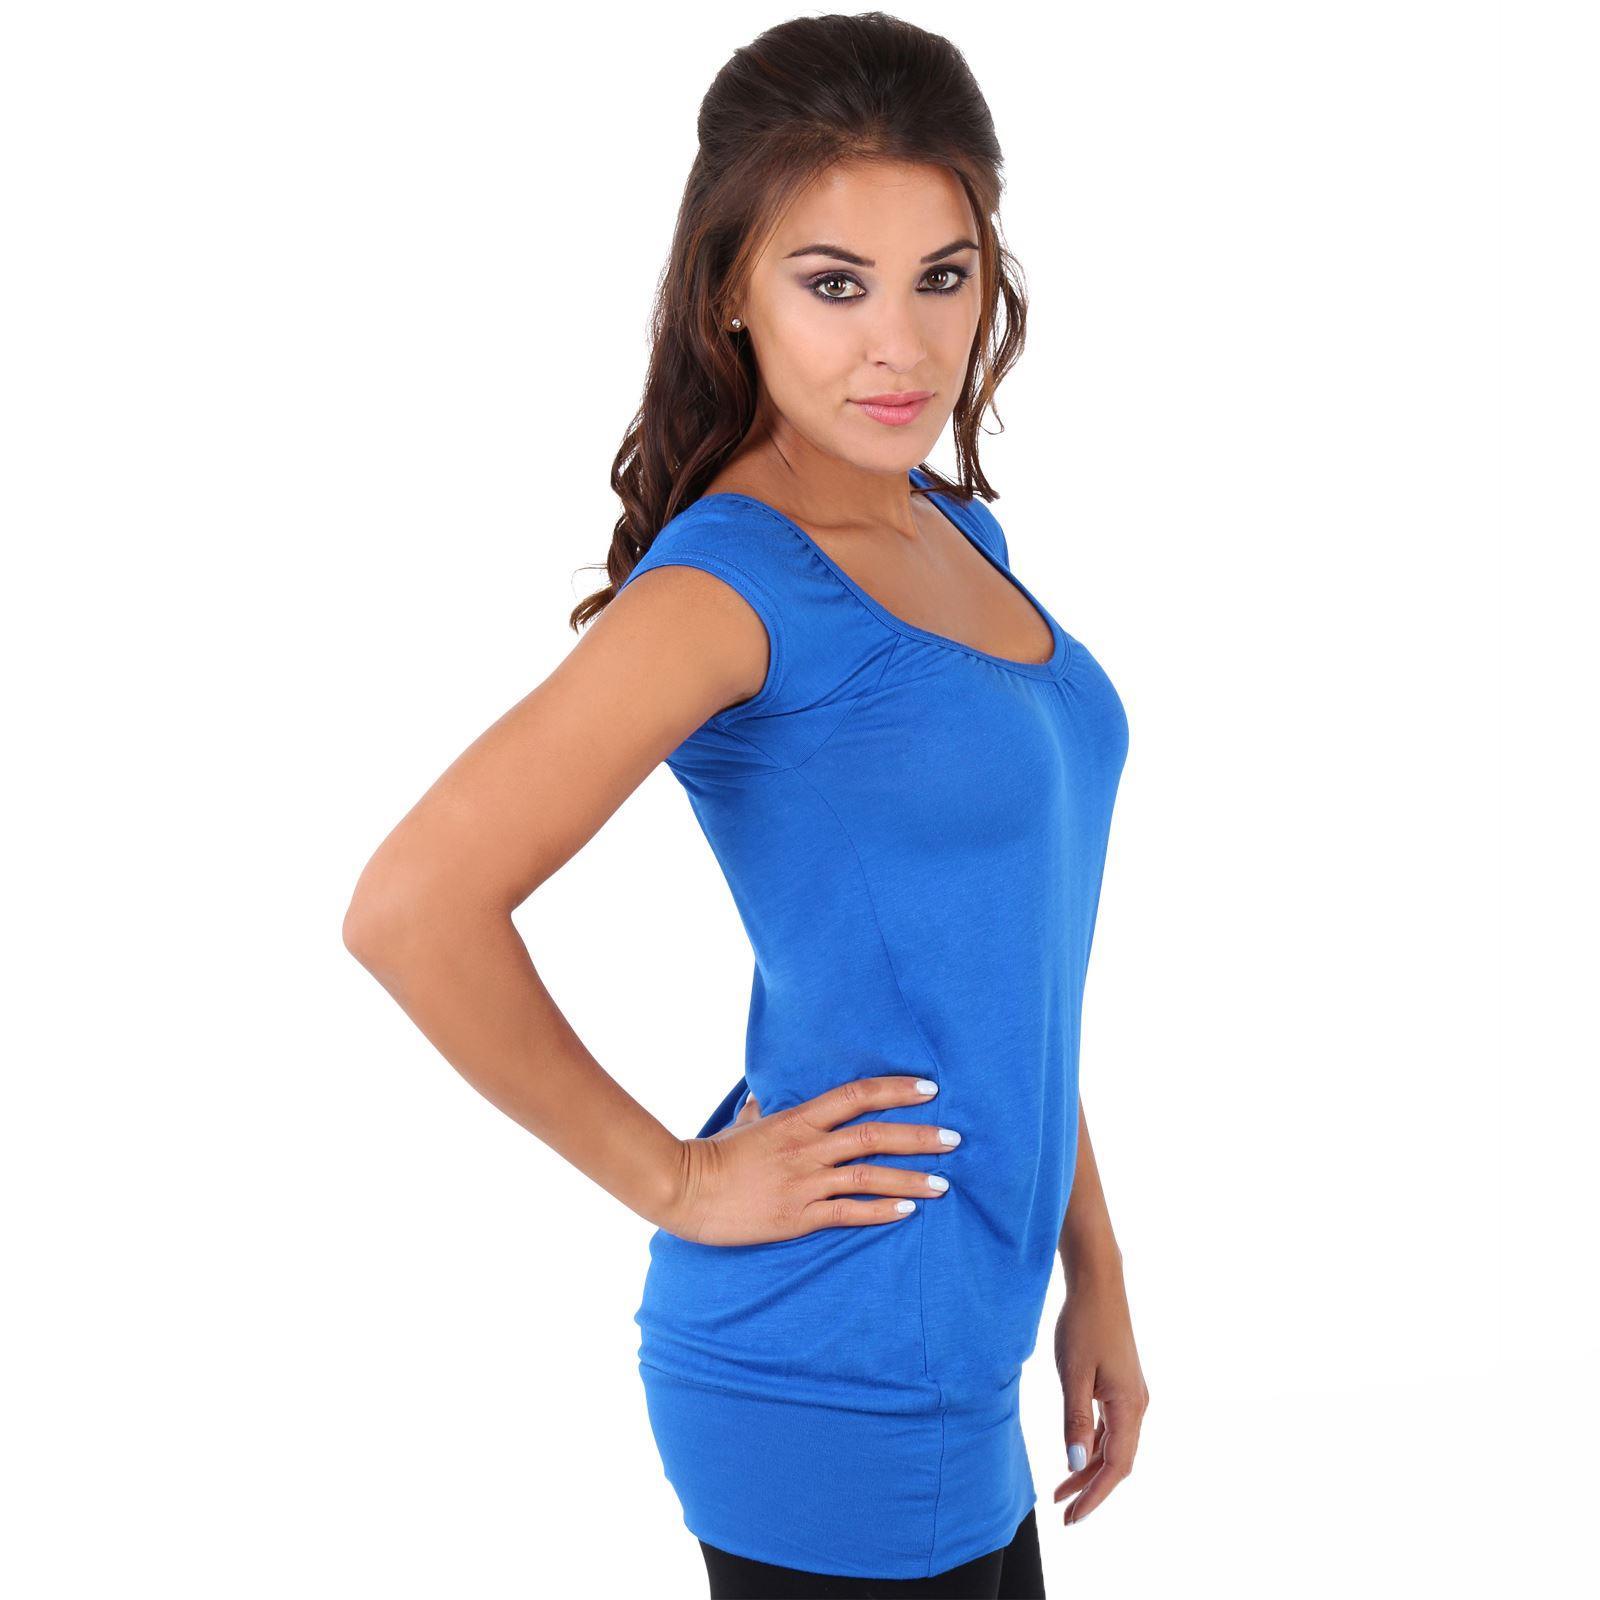 Womens-Ladies-Plain-T-Shirt-Short-Sleeve-Long-Loose-V-Neck-Blouse-Tunic-Top thumbnail 52